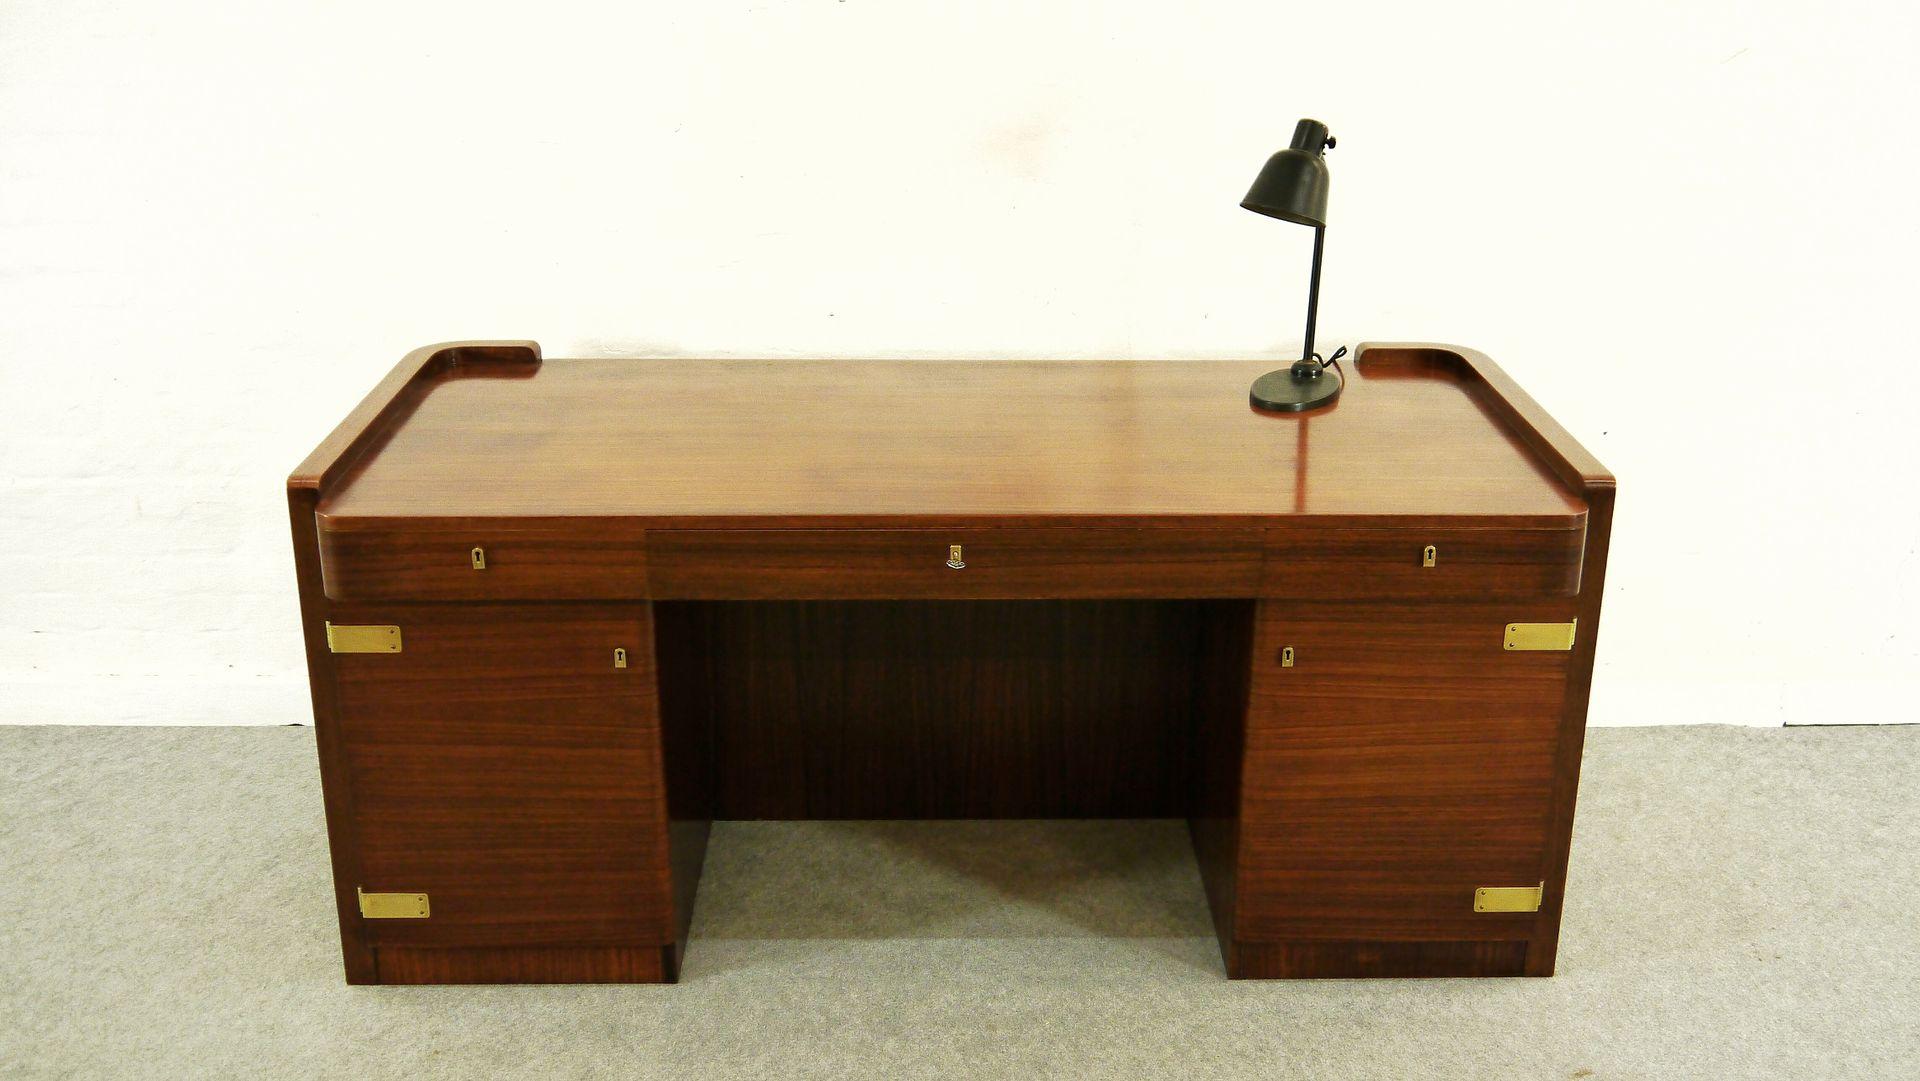 art deco bauhaus mobel m bel und heimat design inspiration. Black Bedroom Furniture Sets. Home Design Ideas